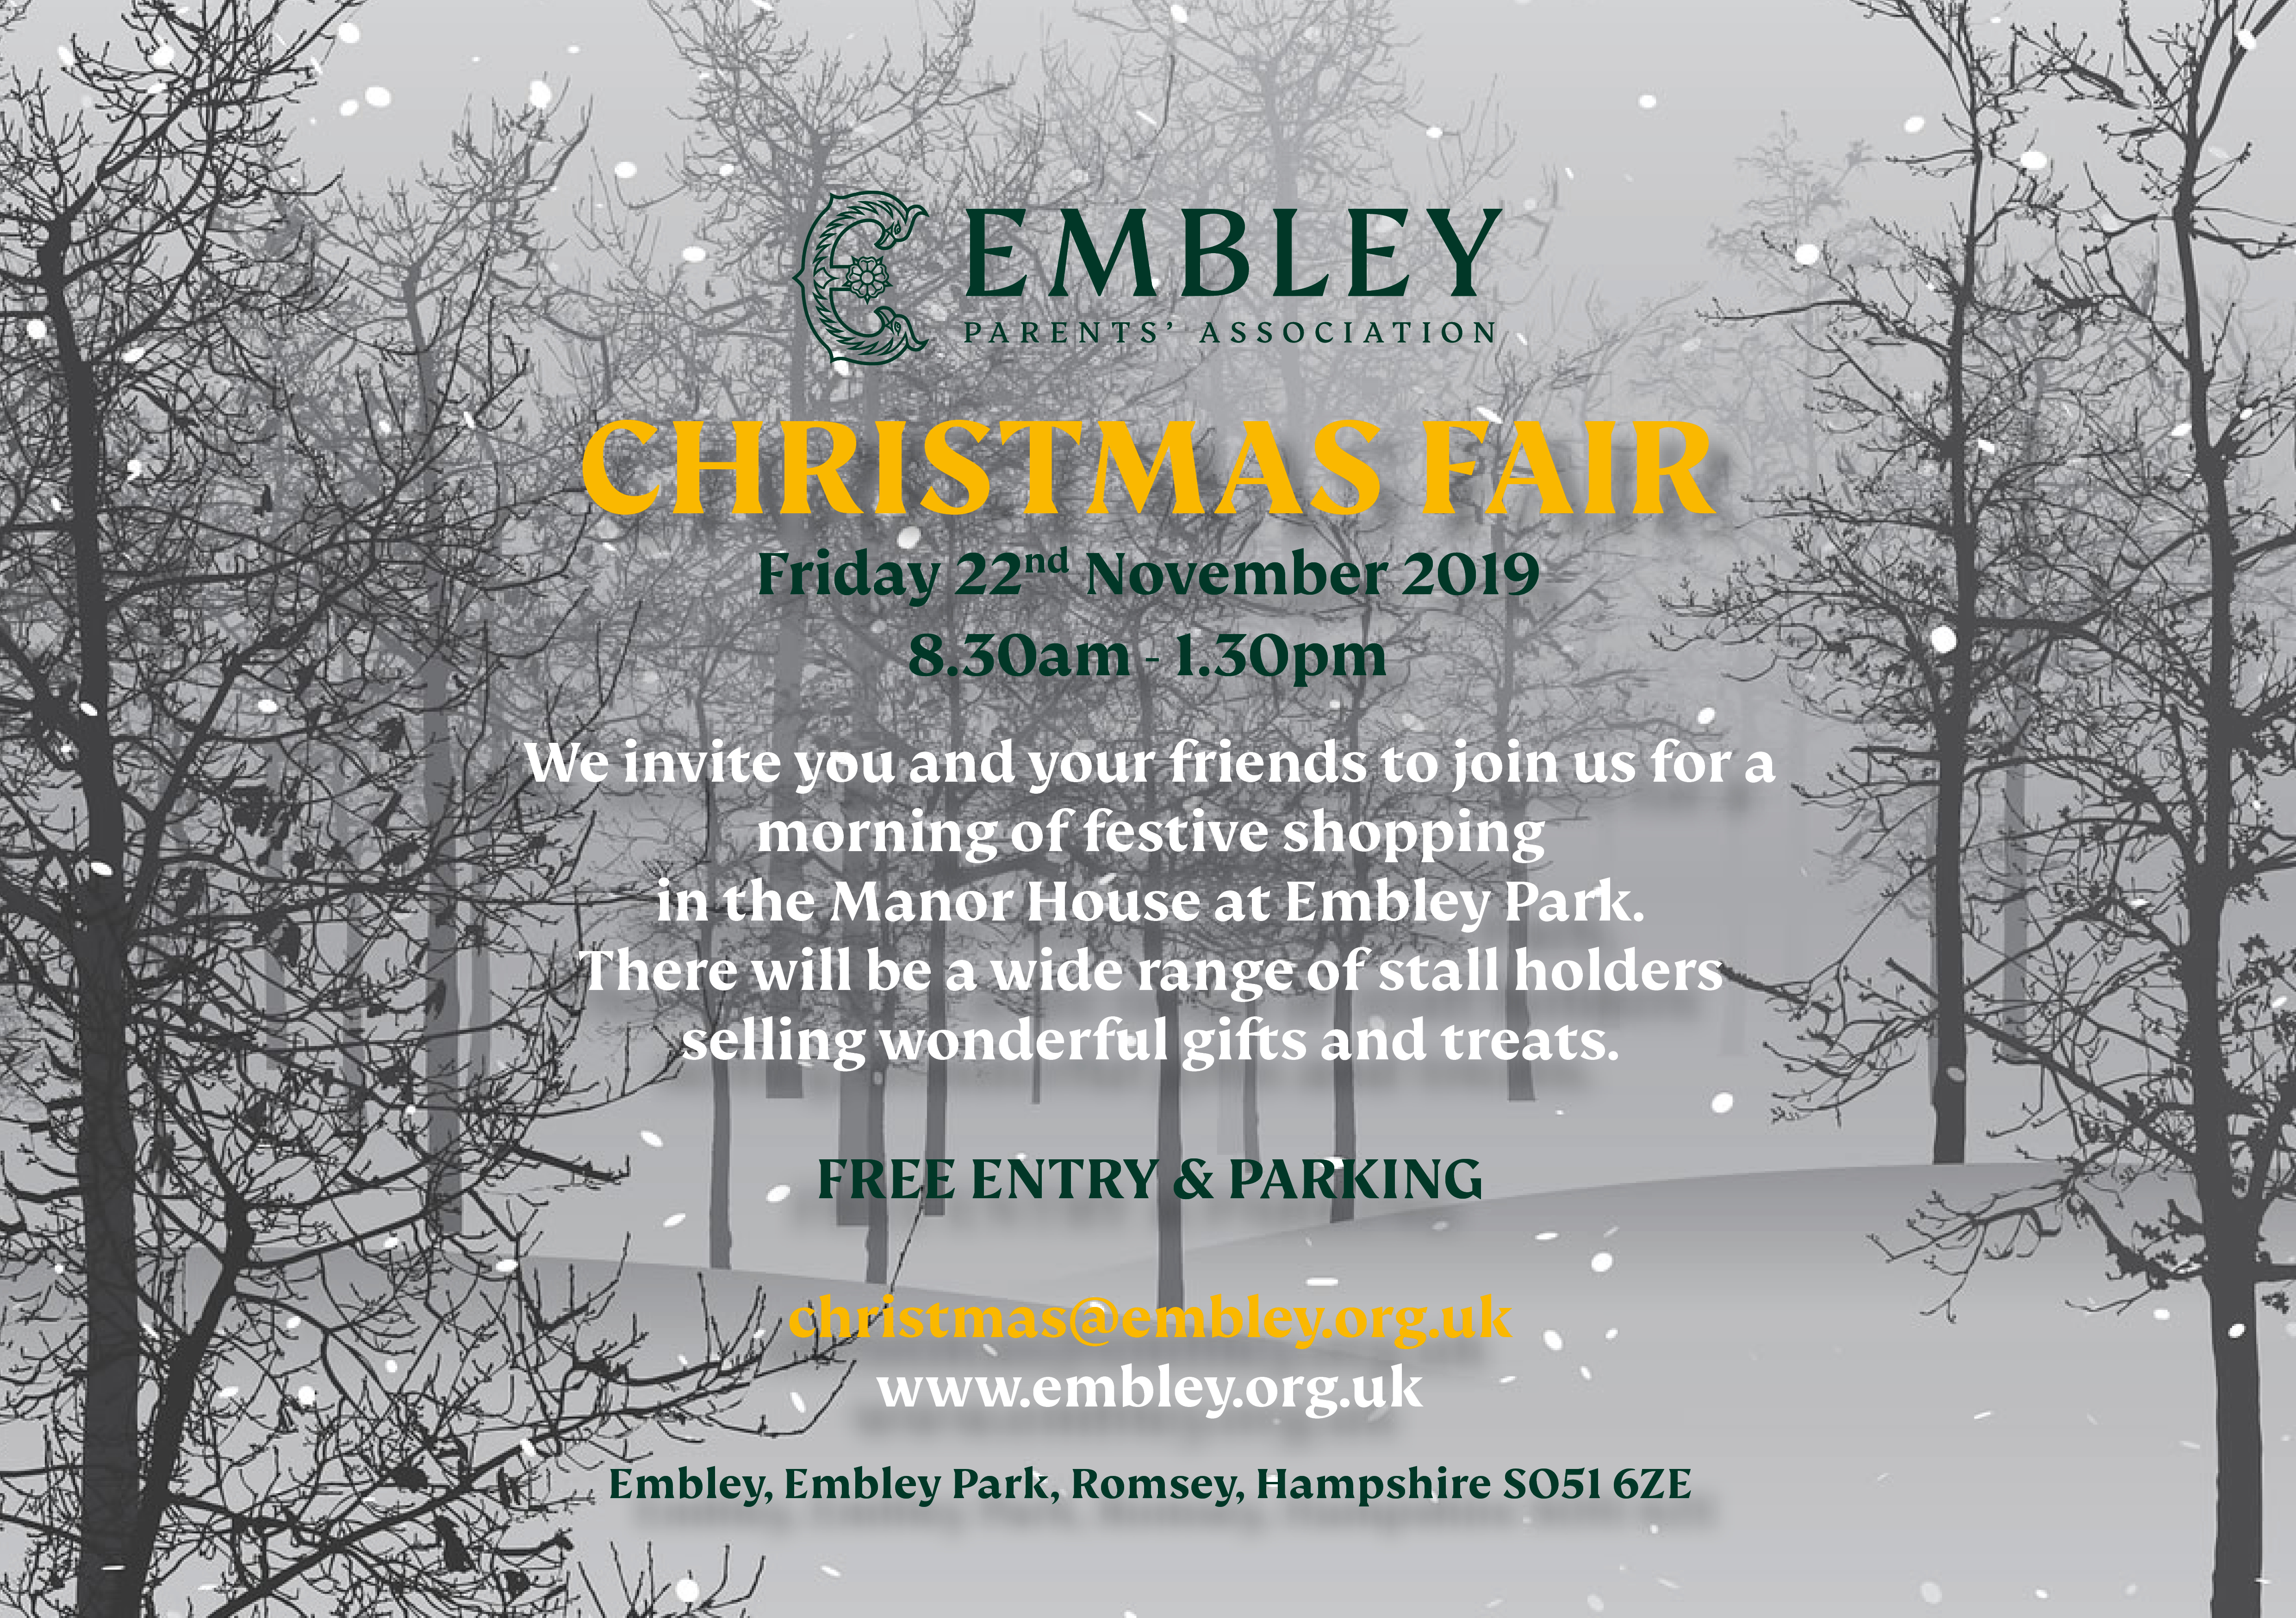 embley-christmas-fair-flyer